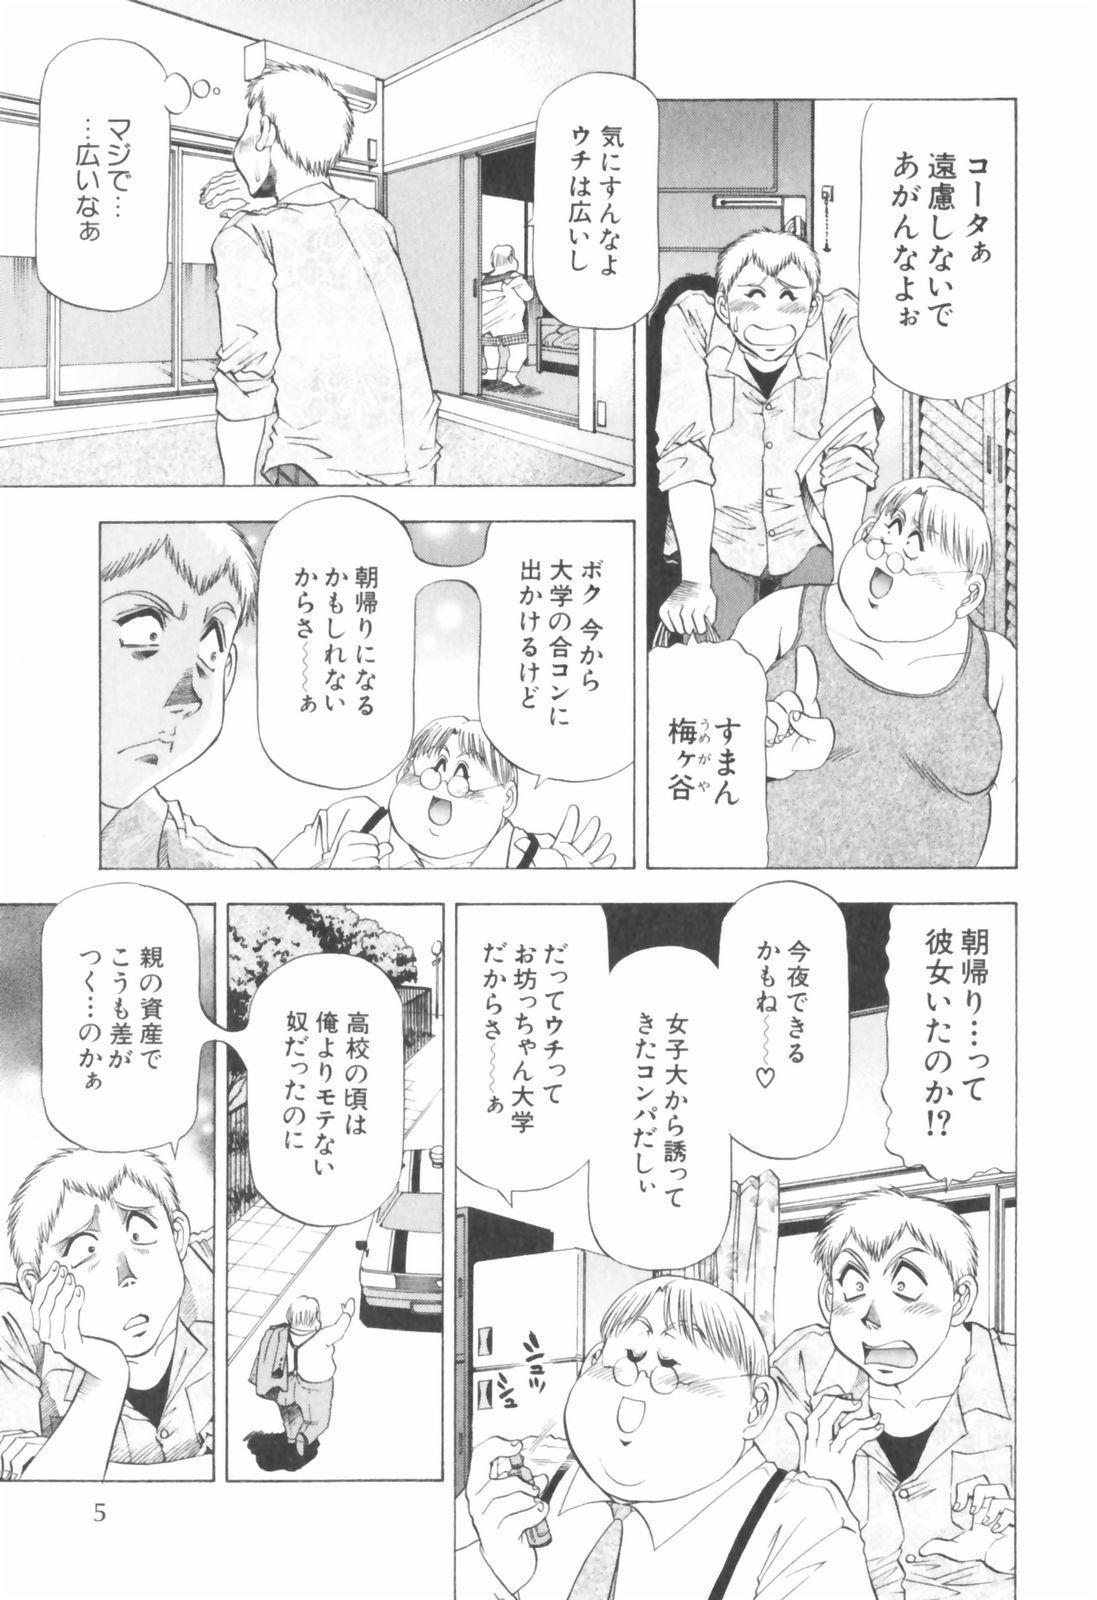 Doukyonin ni Onegai! 6